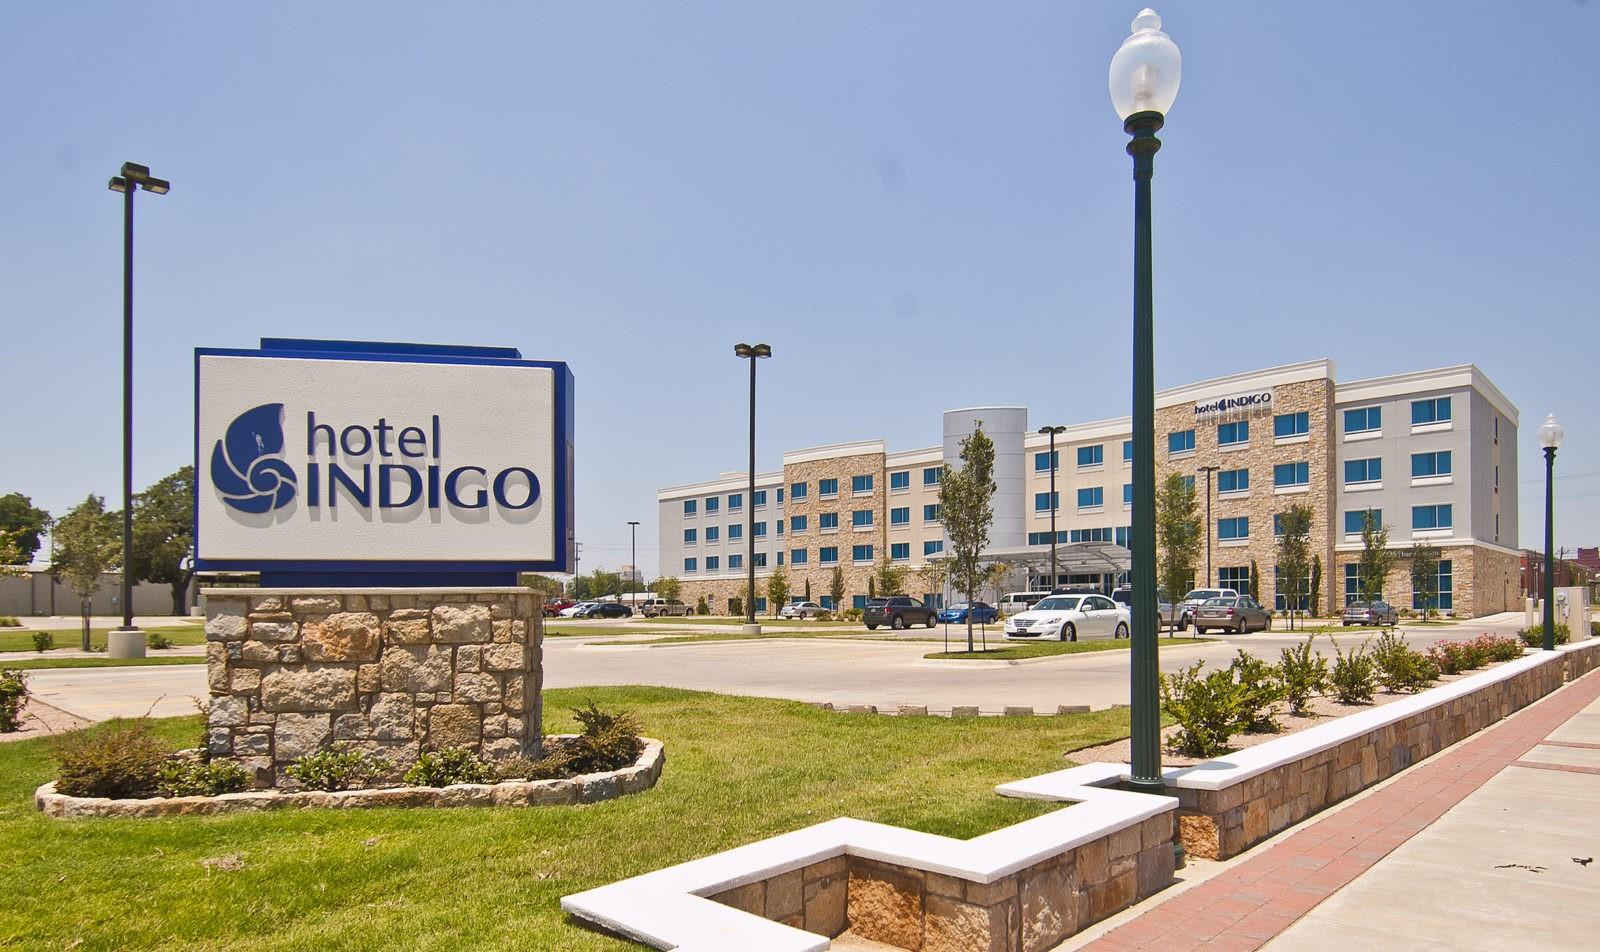 Hotels In Waco Tx Near I